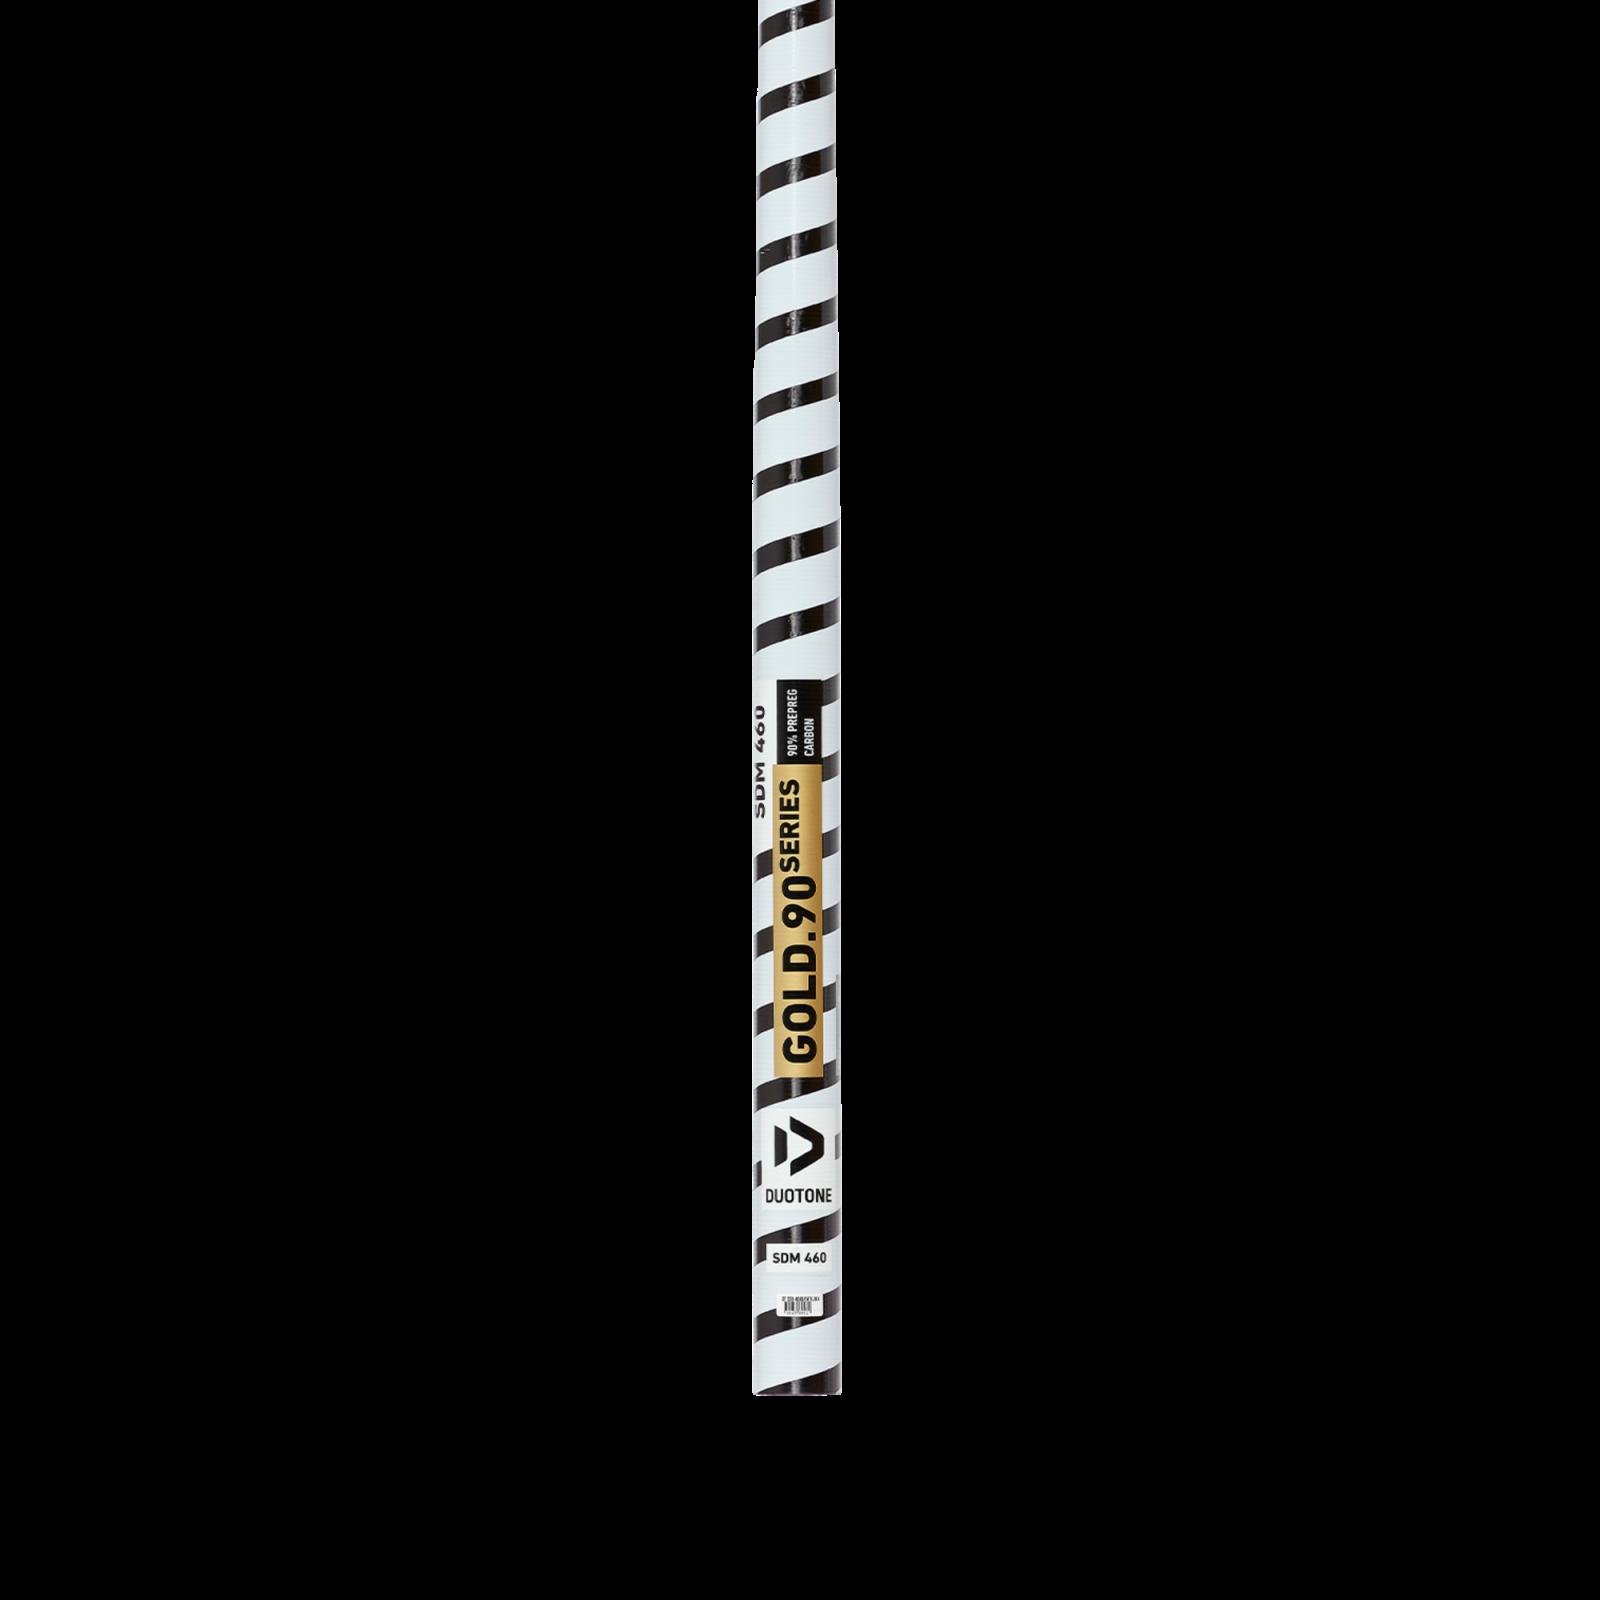 Duotone Gold.90 SDM Mast